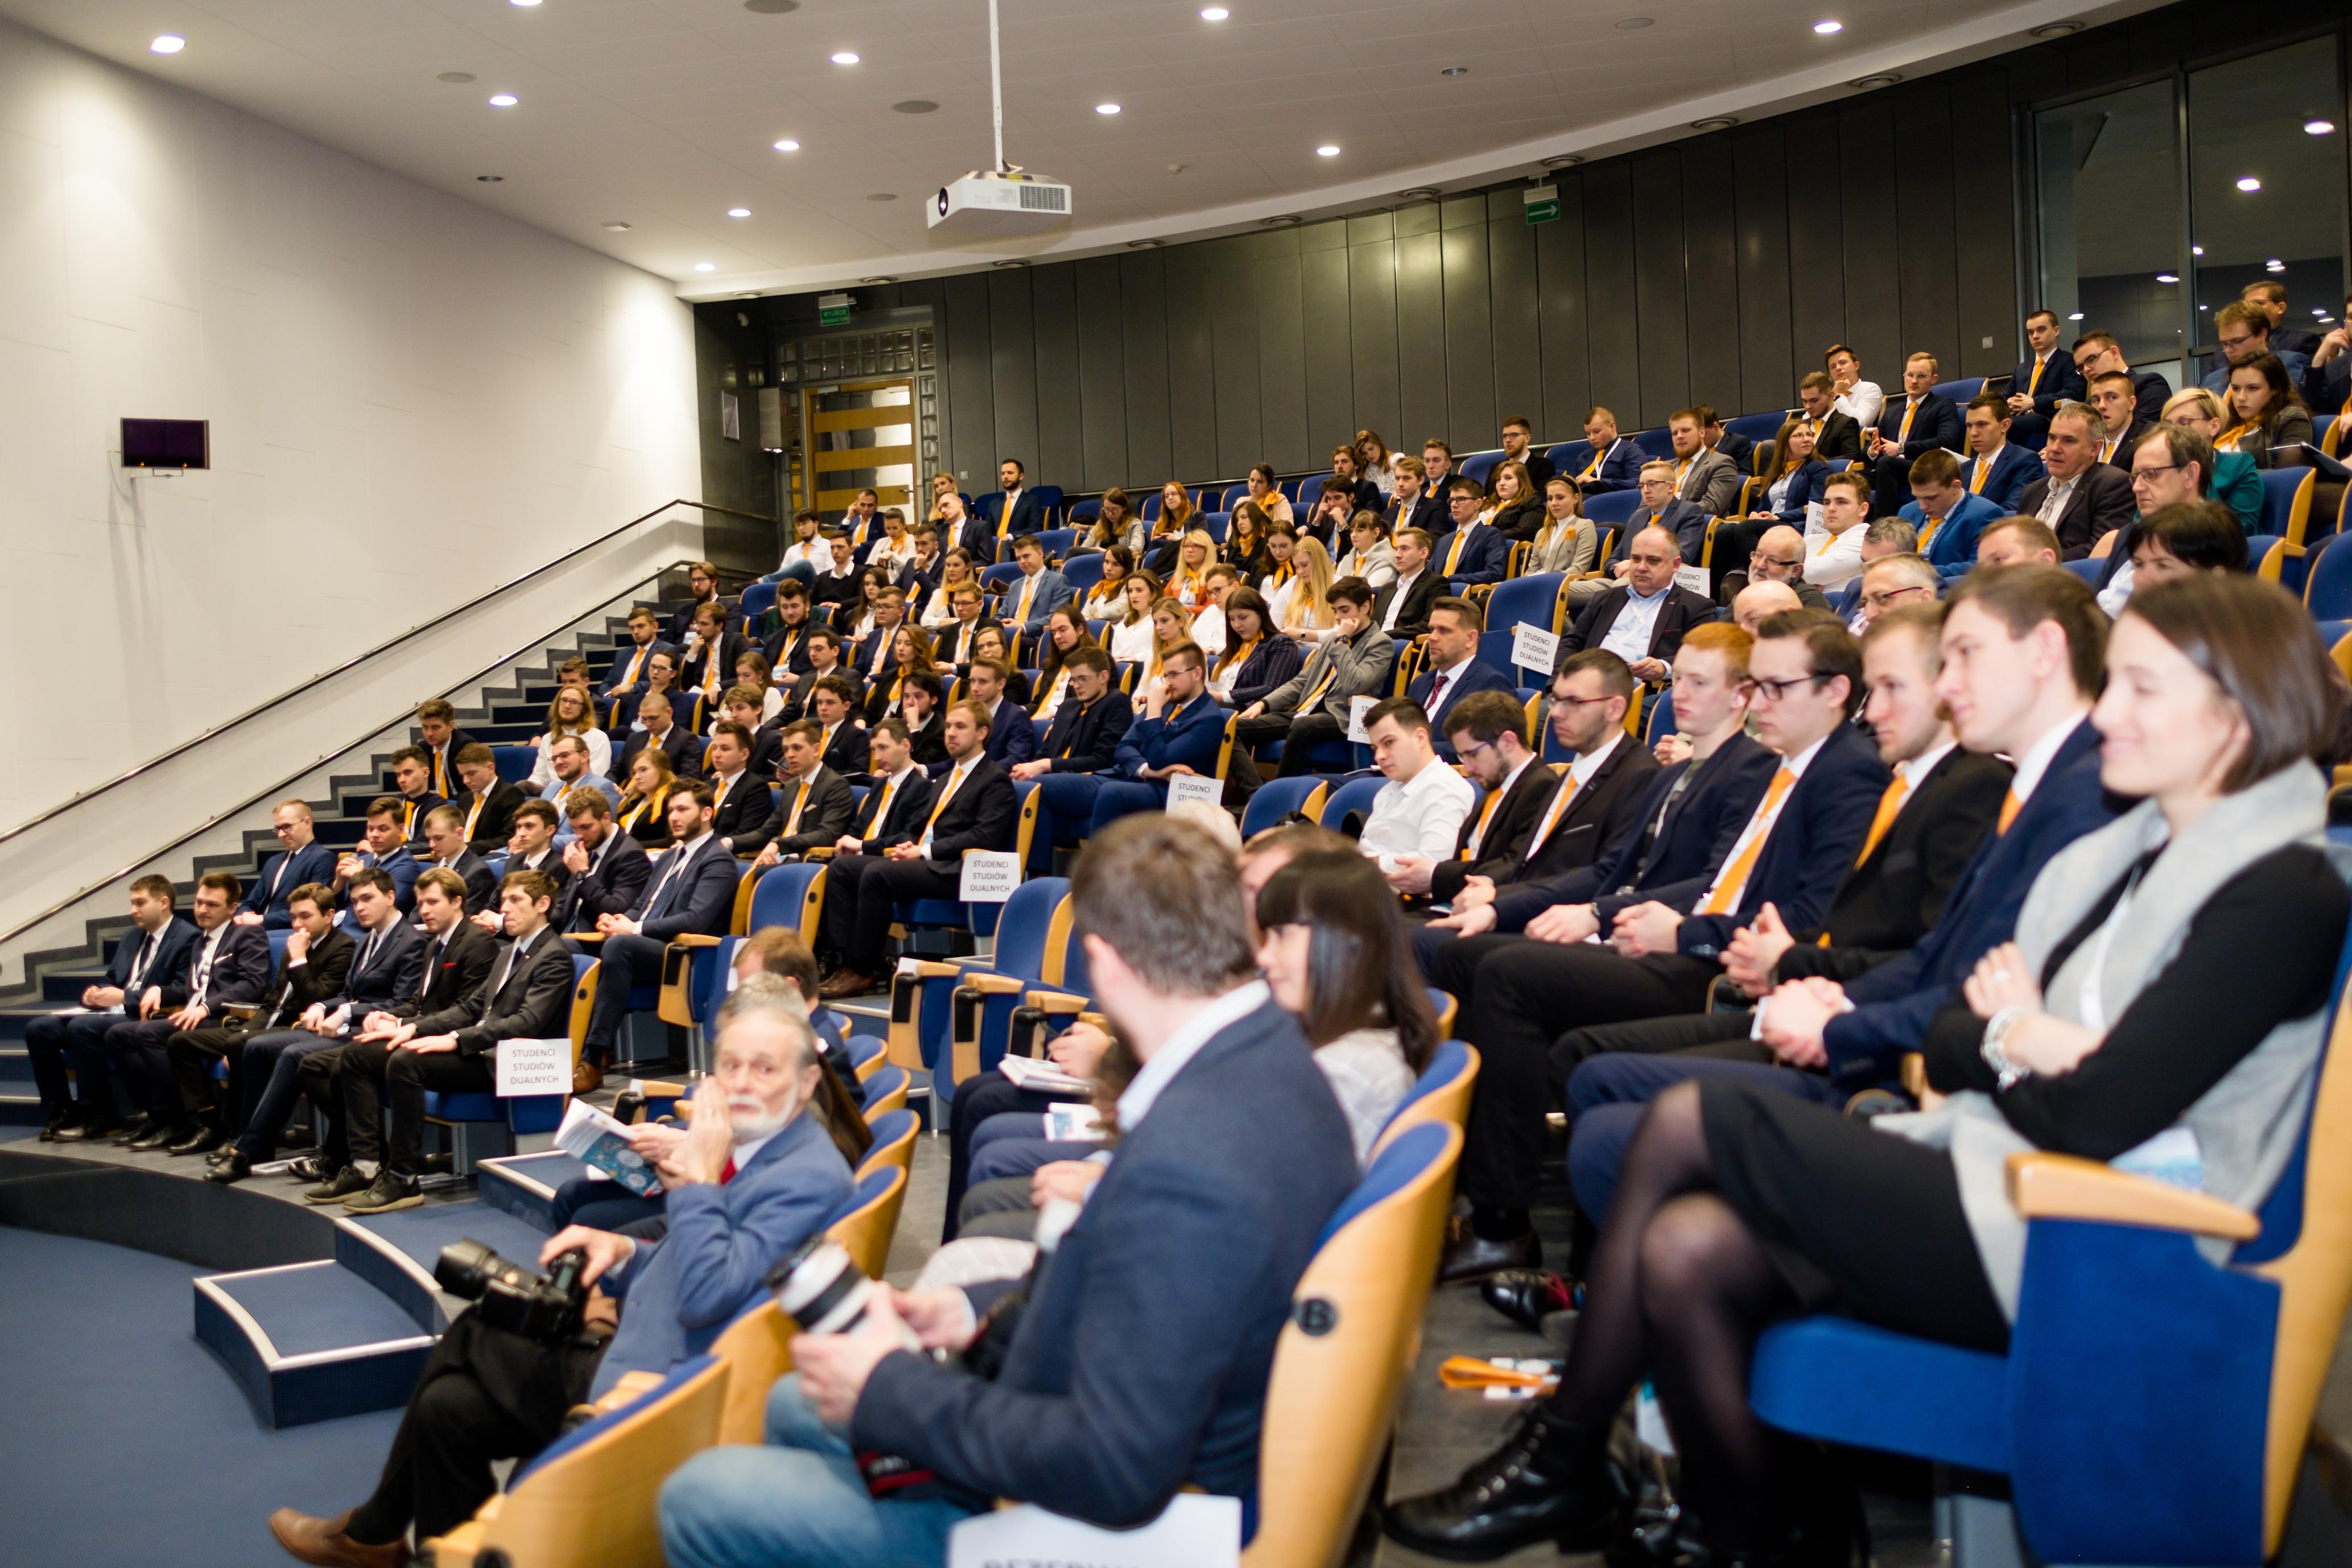 Konferencja Edual aula studenci